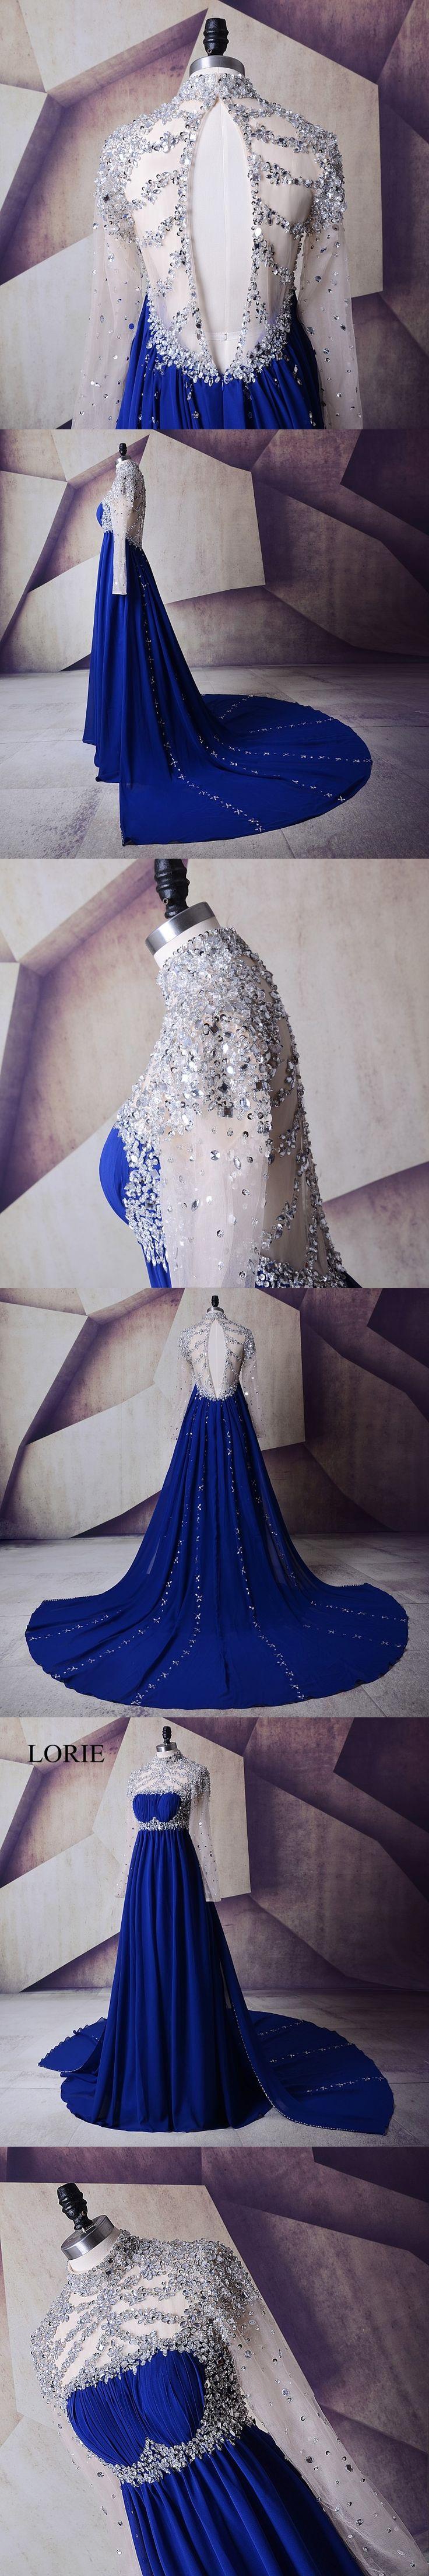 Maternity Evening Dresses For Pregnant 2017 Abendkleider Crystals Beaded Elegant Women Long Prom Dresses For Wedding Party